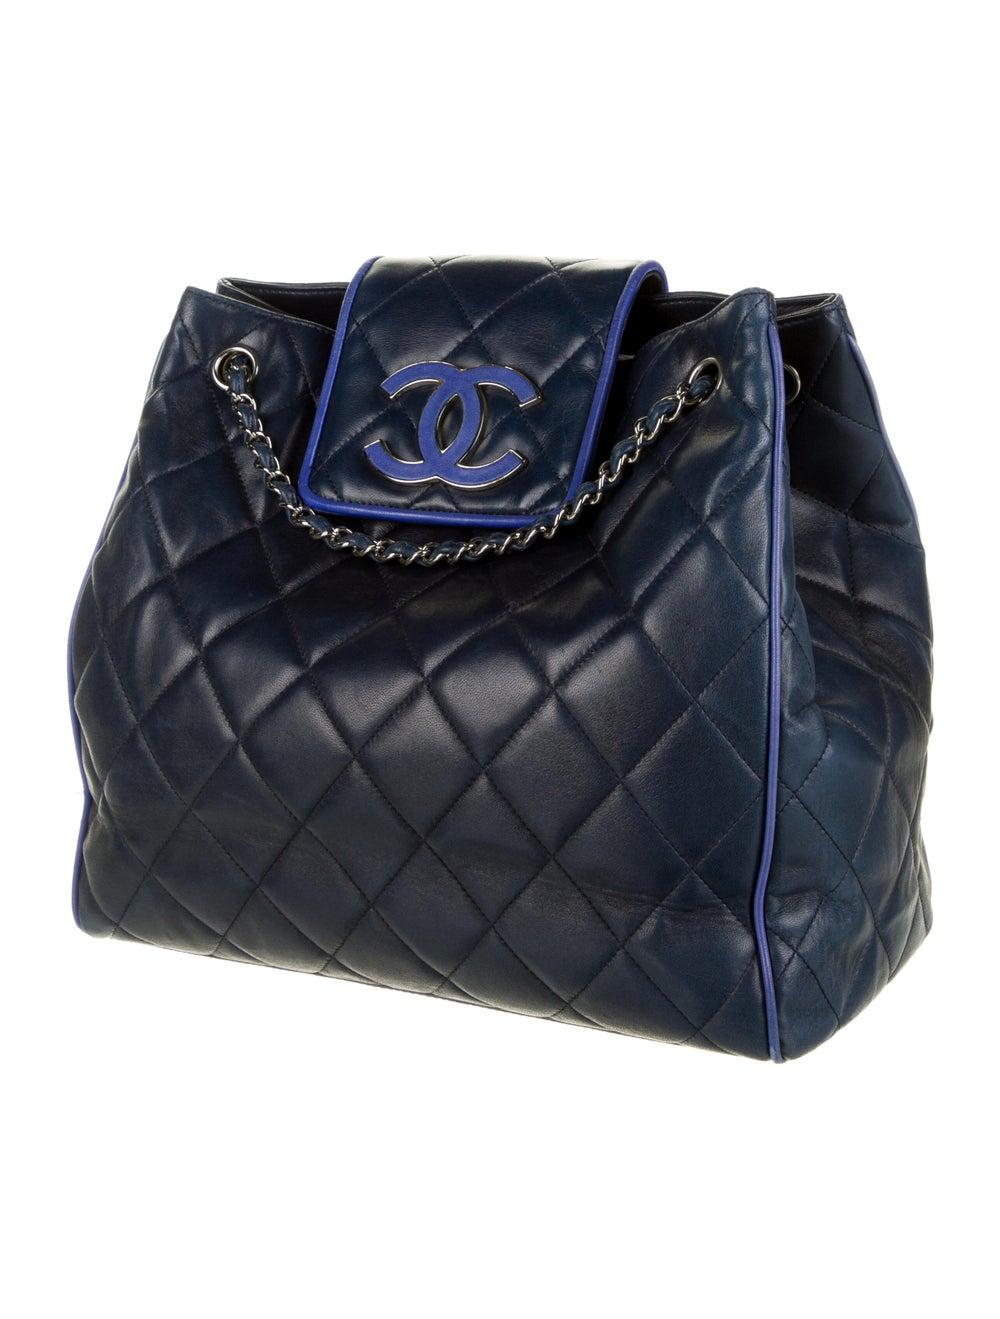 Chanel Hamptons CC Accordion Flap Bag Blue - image 3